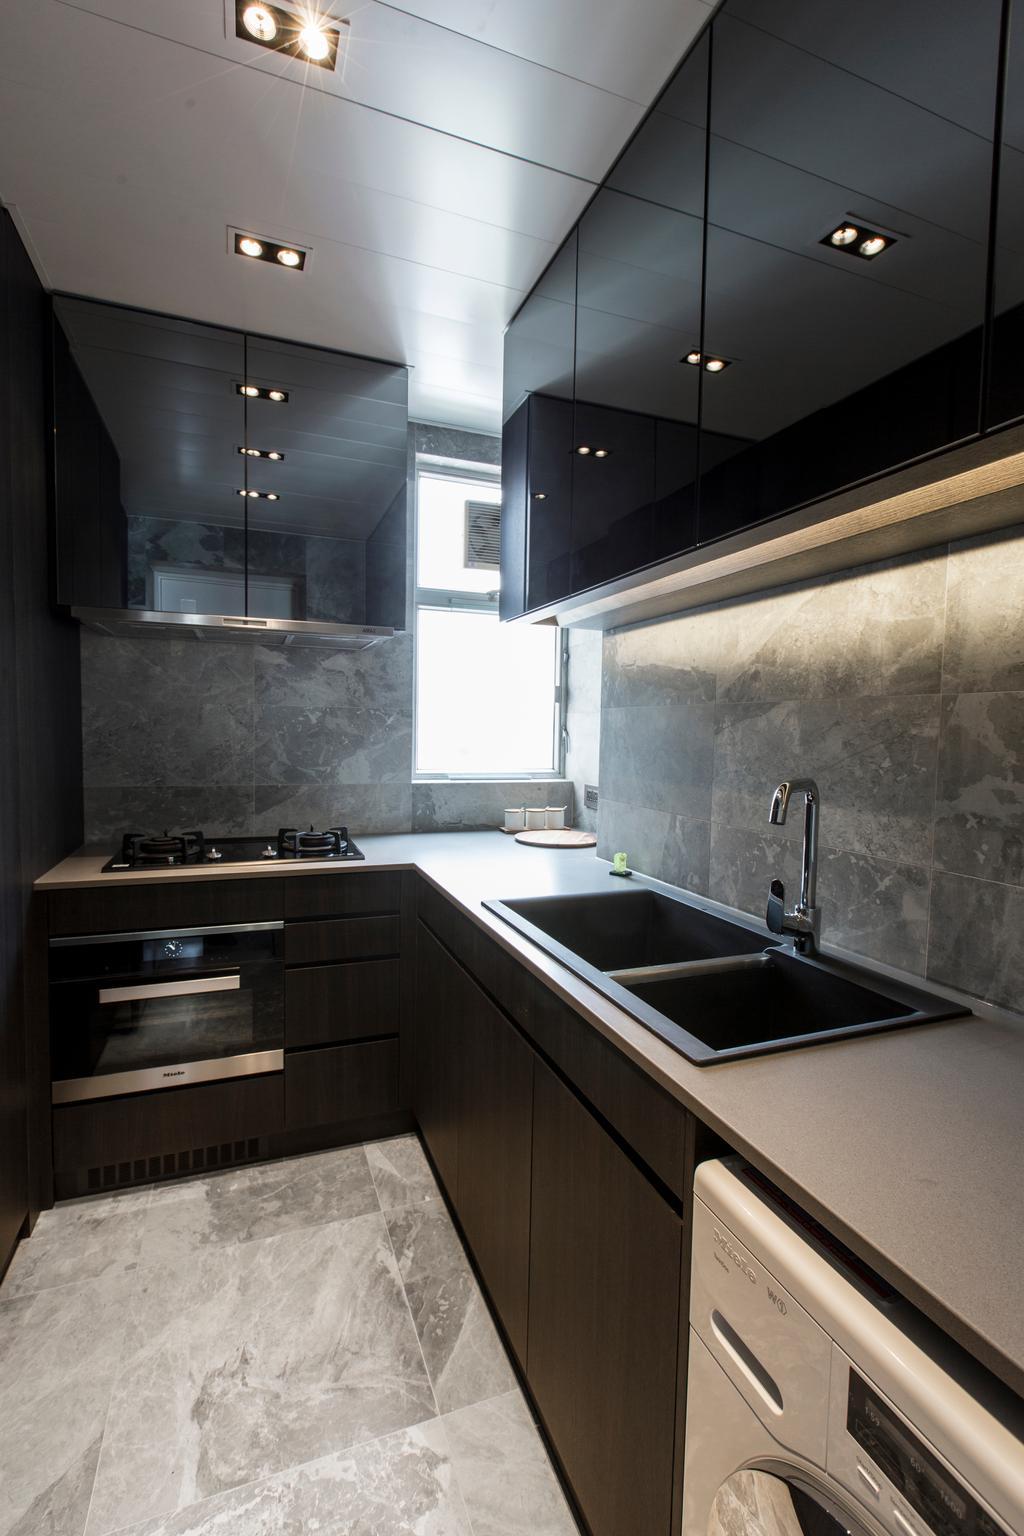 摩登, 私家樓, 廚房, 九龍塘, 室內設計師, O - Square Interior Design, 簡約